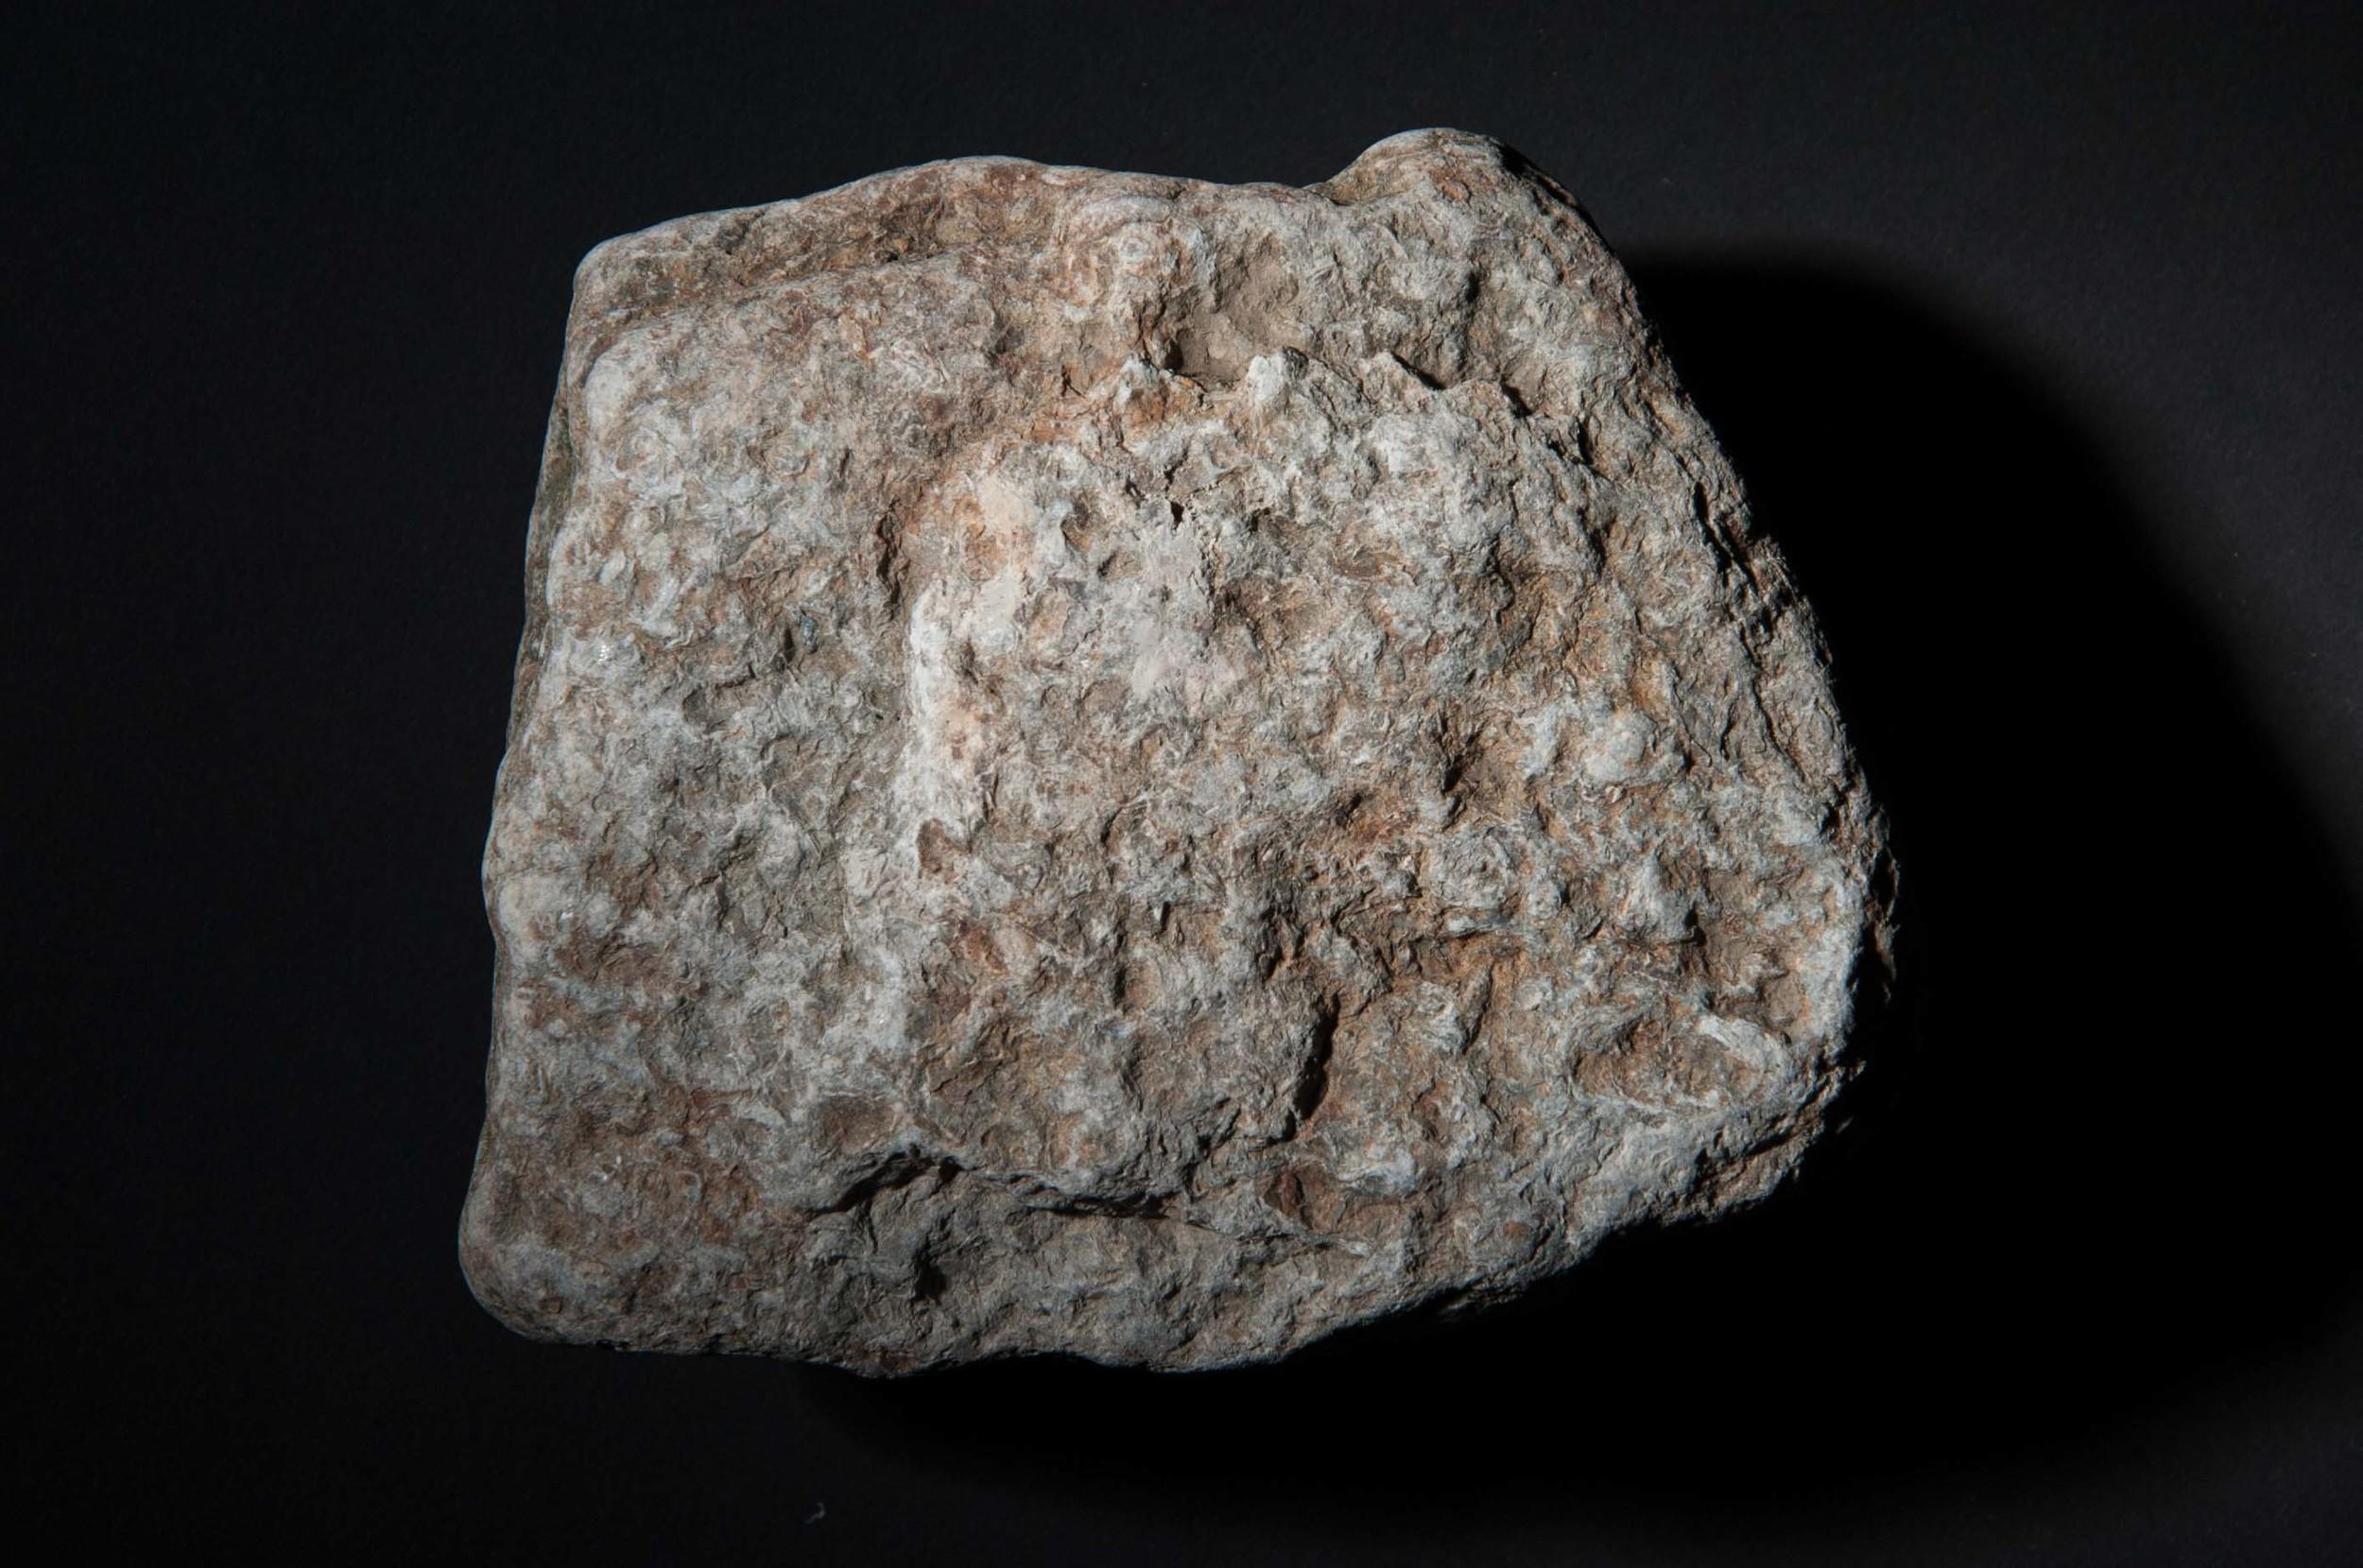 Tiny Rocks-10.jpg